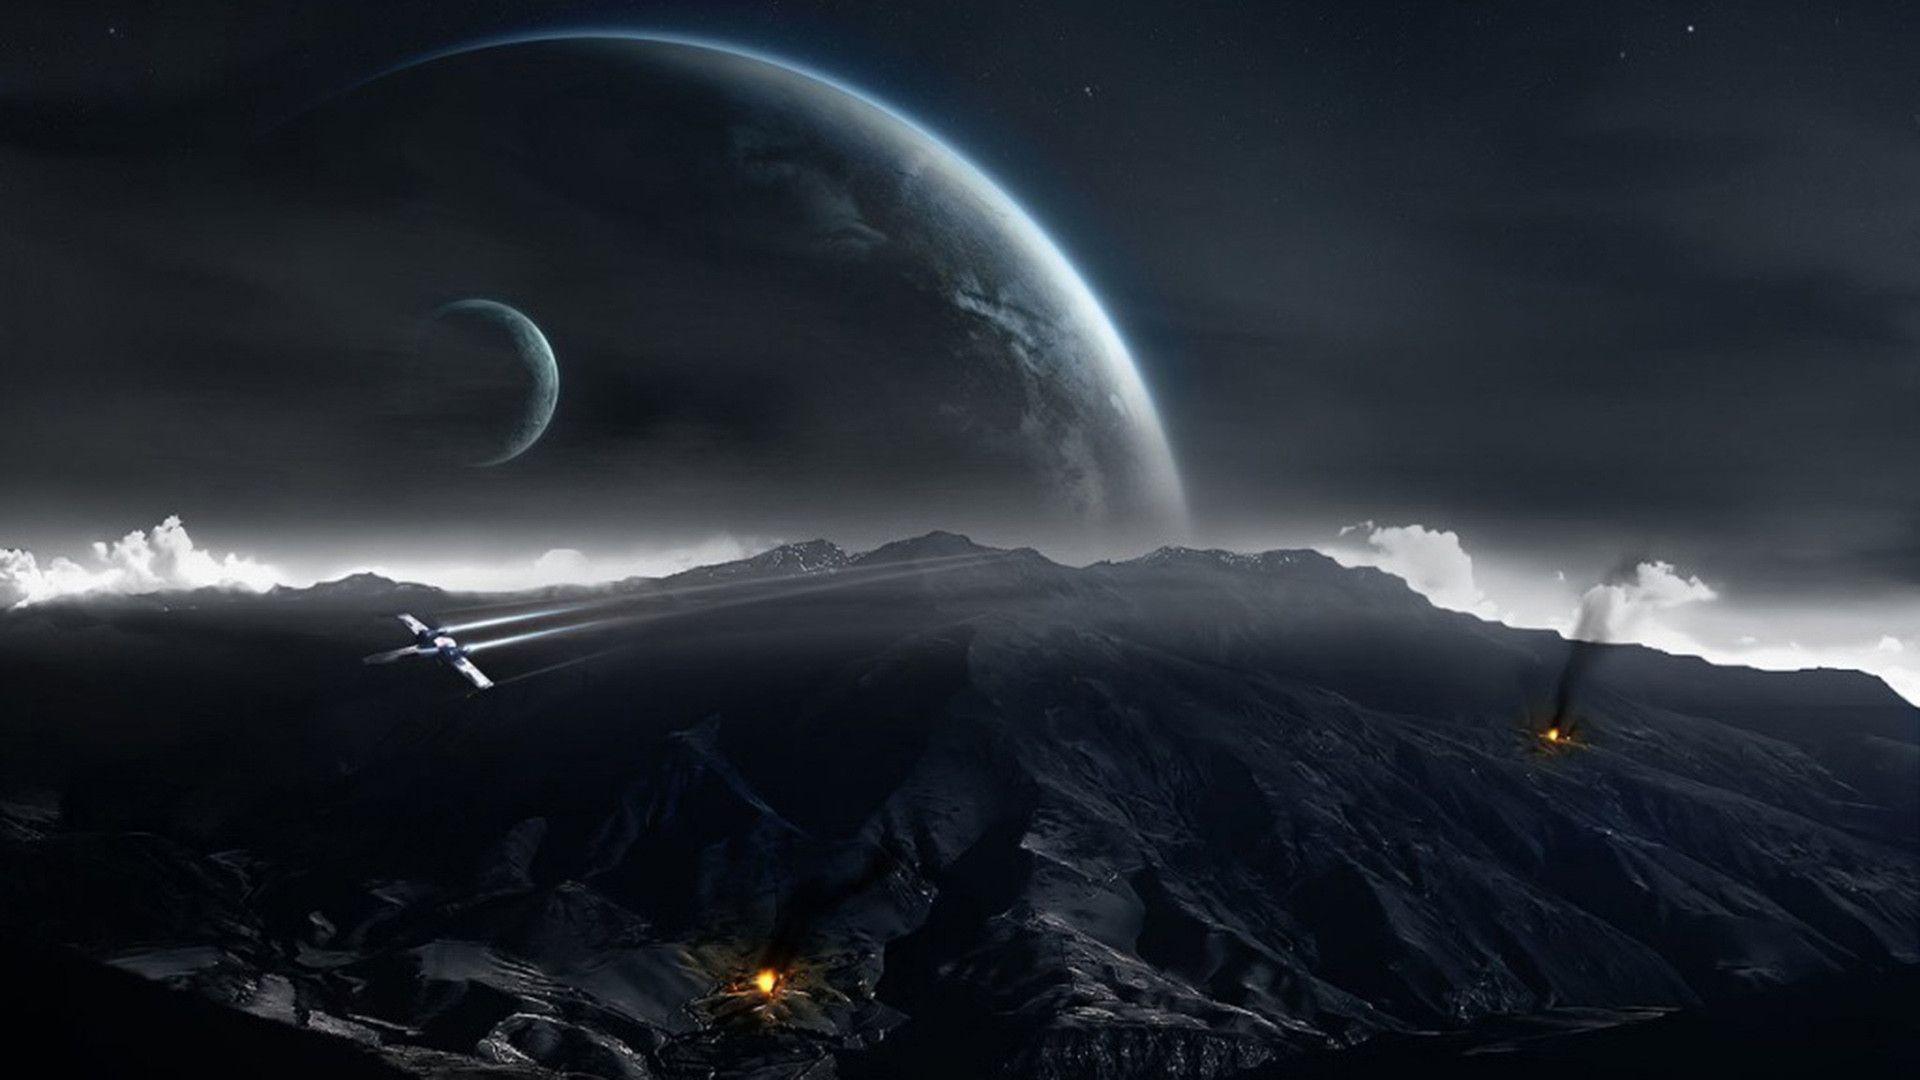 Epic Space War Wallpaper Images 3te Space Art Wallpaper Star Wars Wallpaper Planets Wallpaper